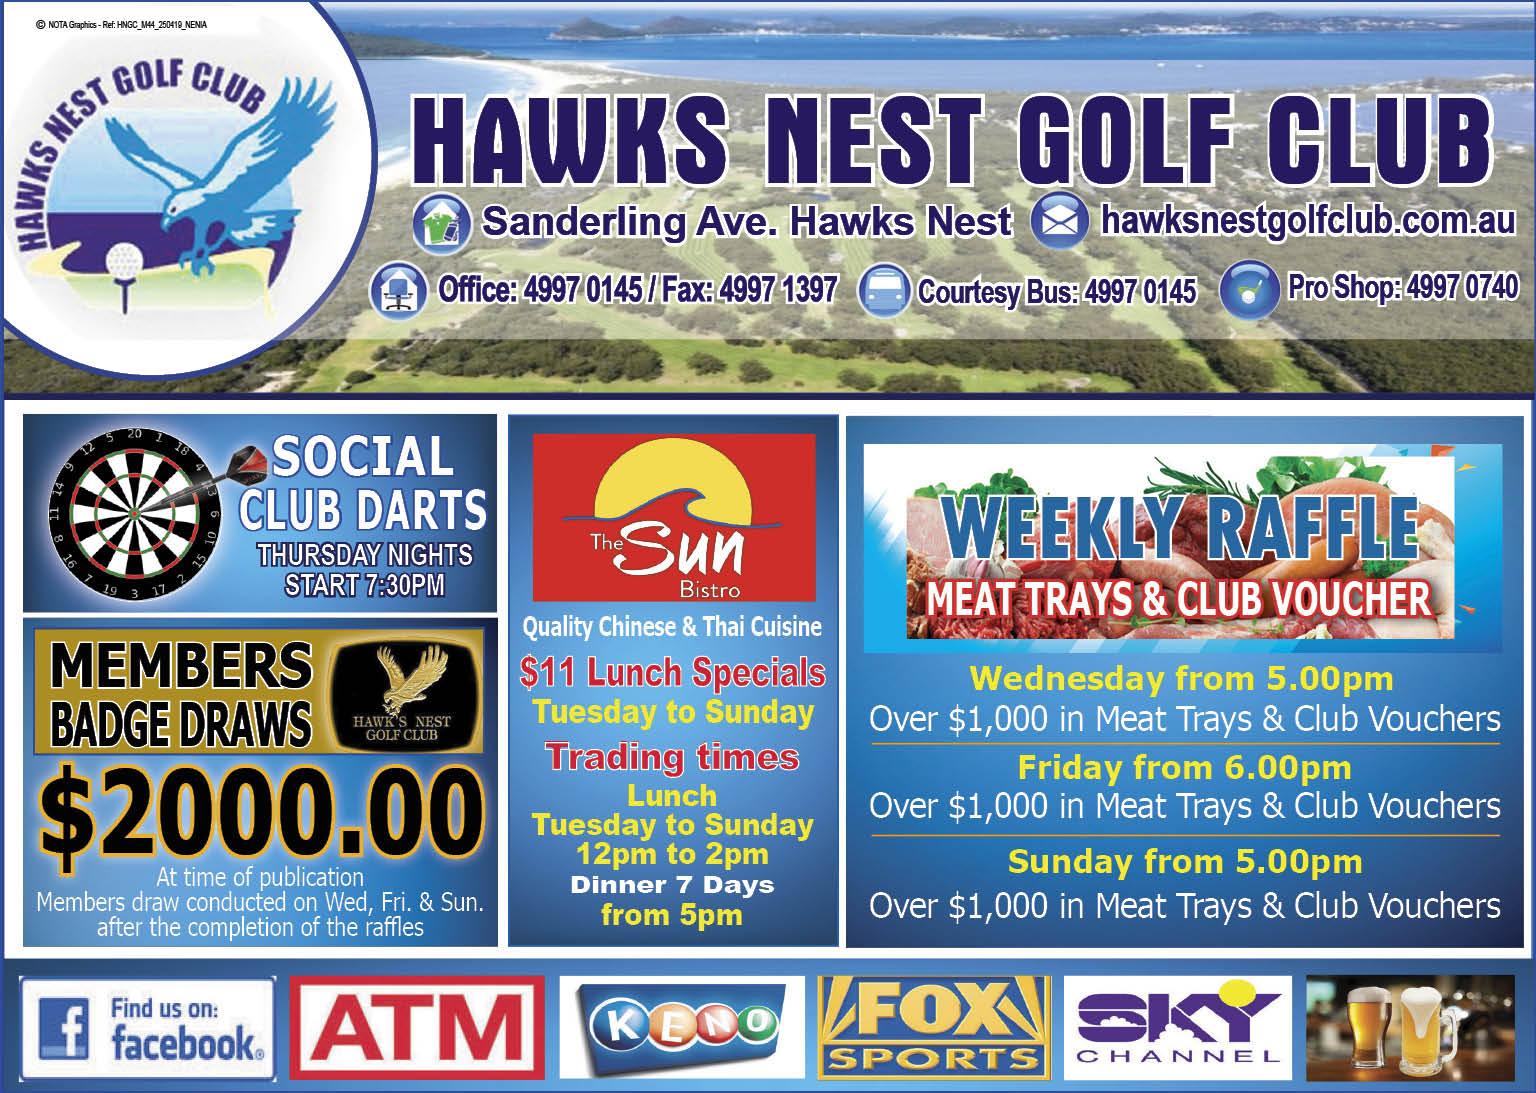 Hawks Nest Golf Club